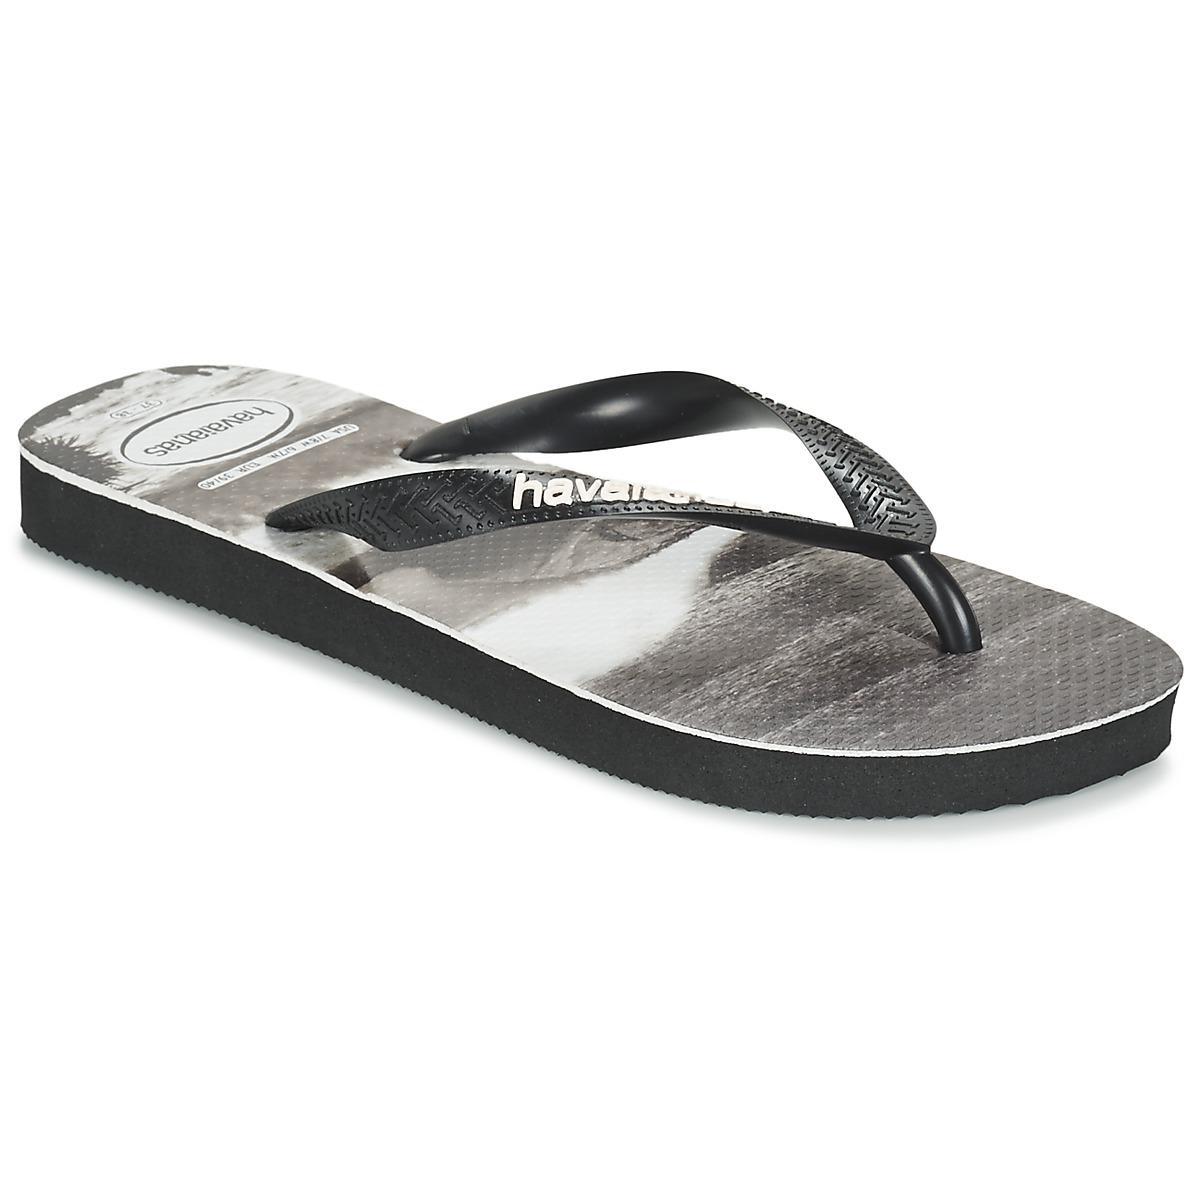 eae1af9441d6 Havaianas Photoprint Men s Flip Flops   Sandals (shoes) In Black in ...